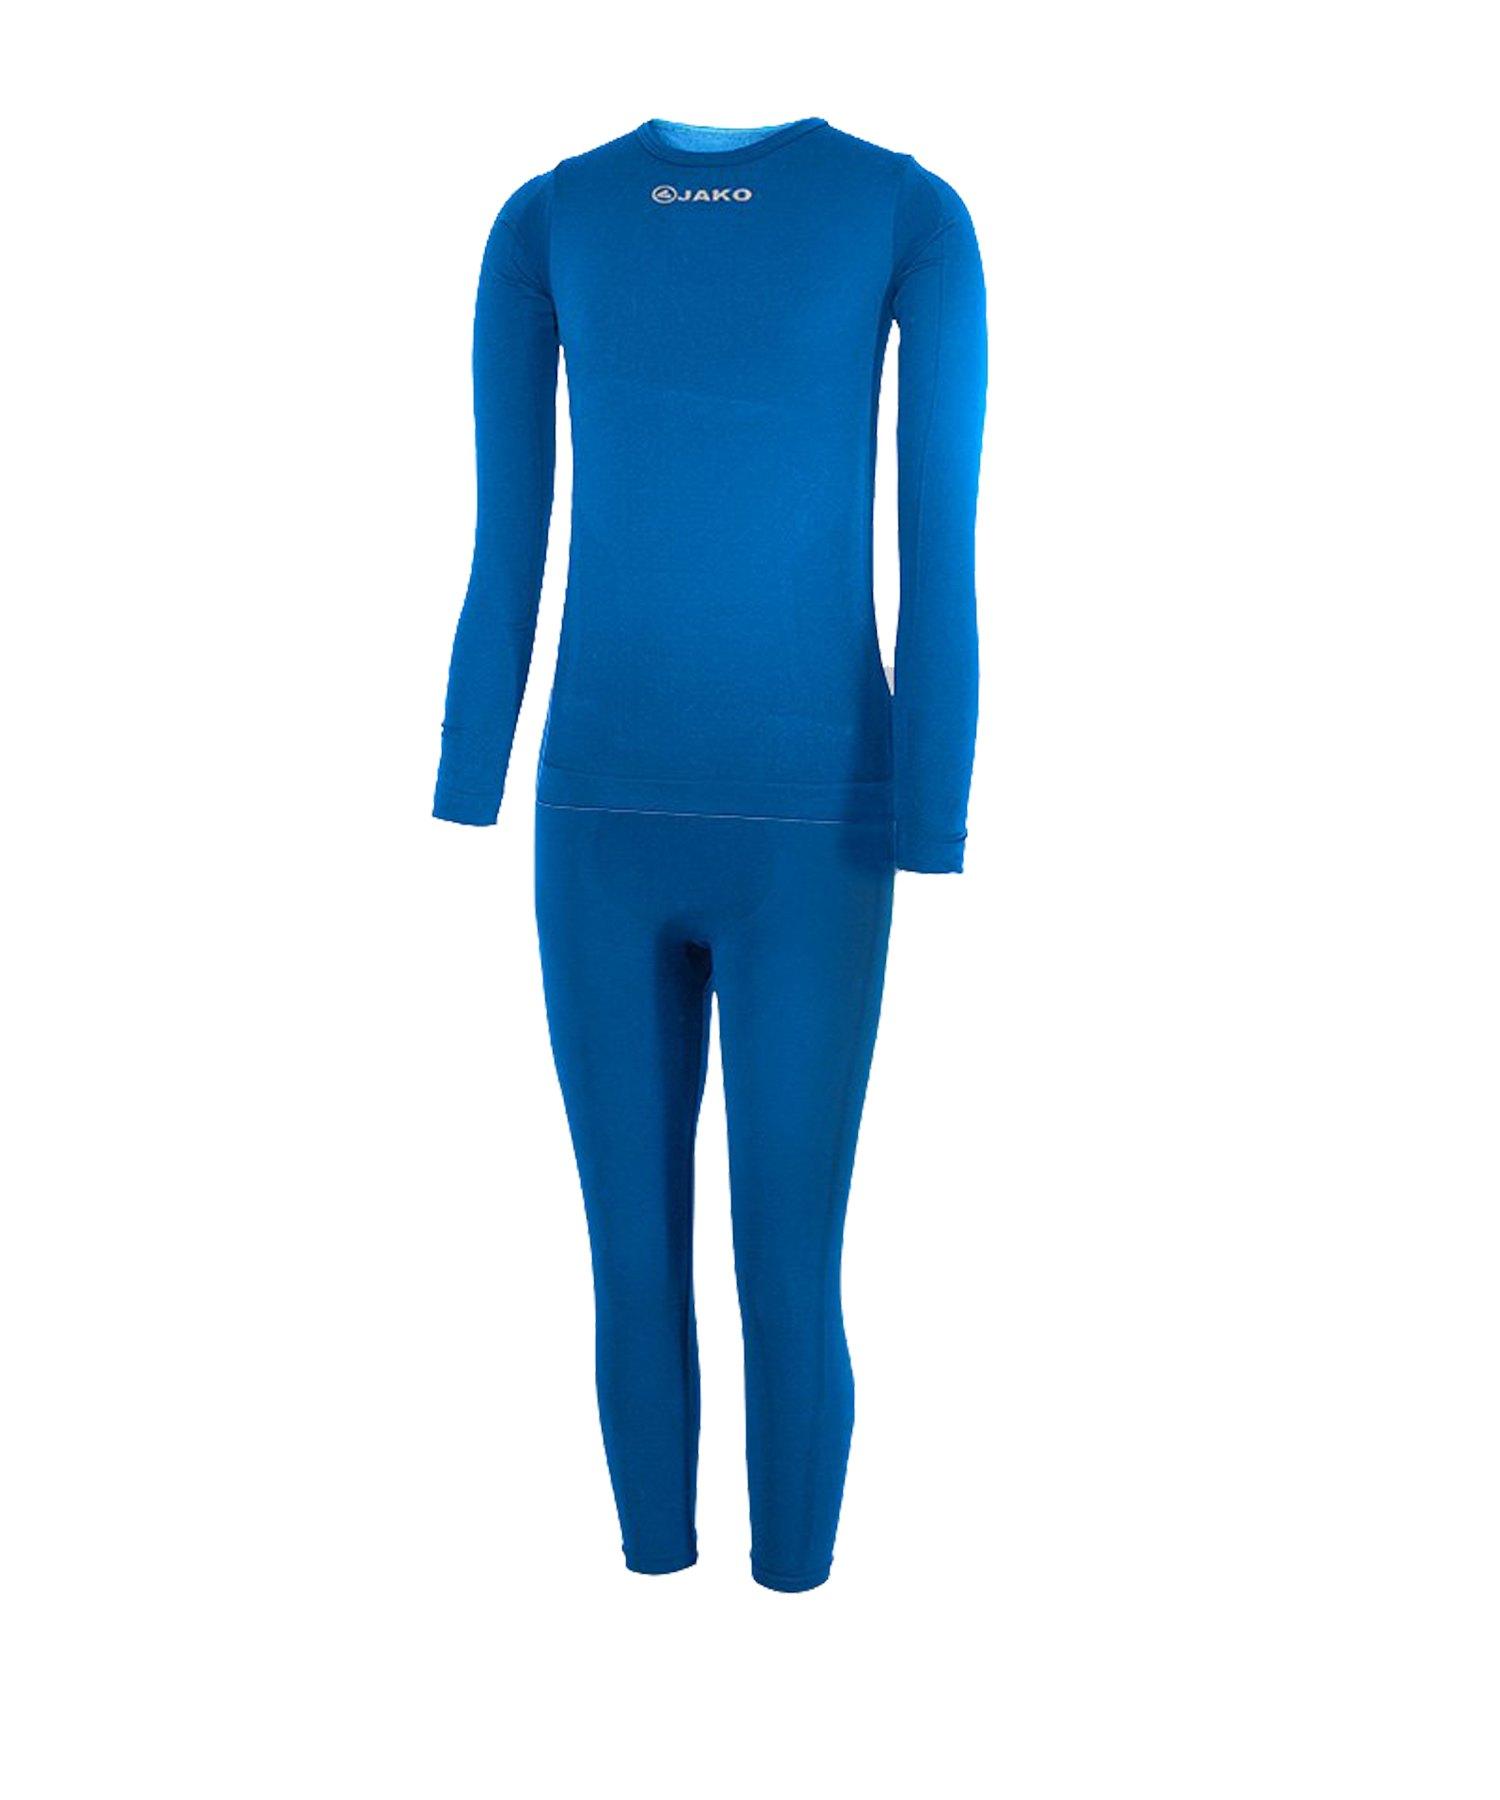 Jako Underwear Kinderset Blau F04 - blau